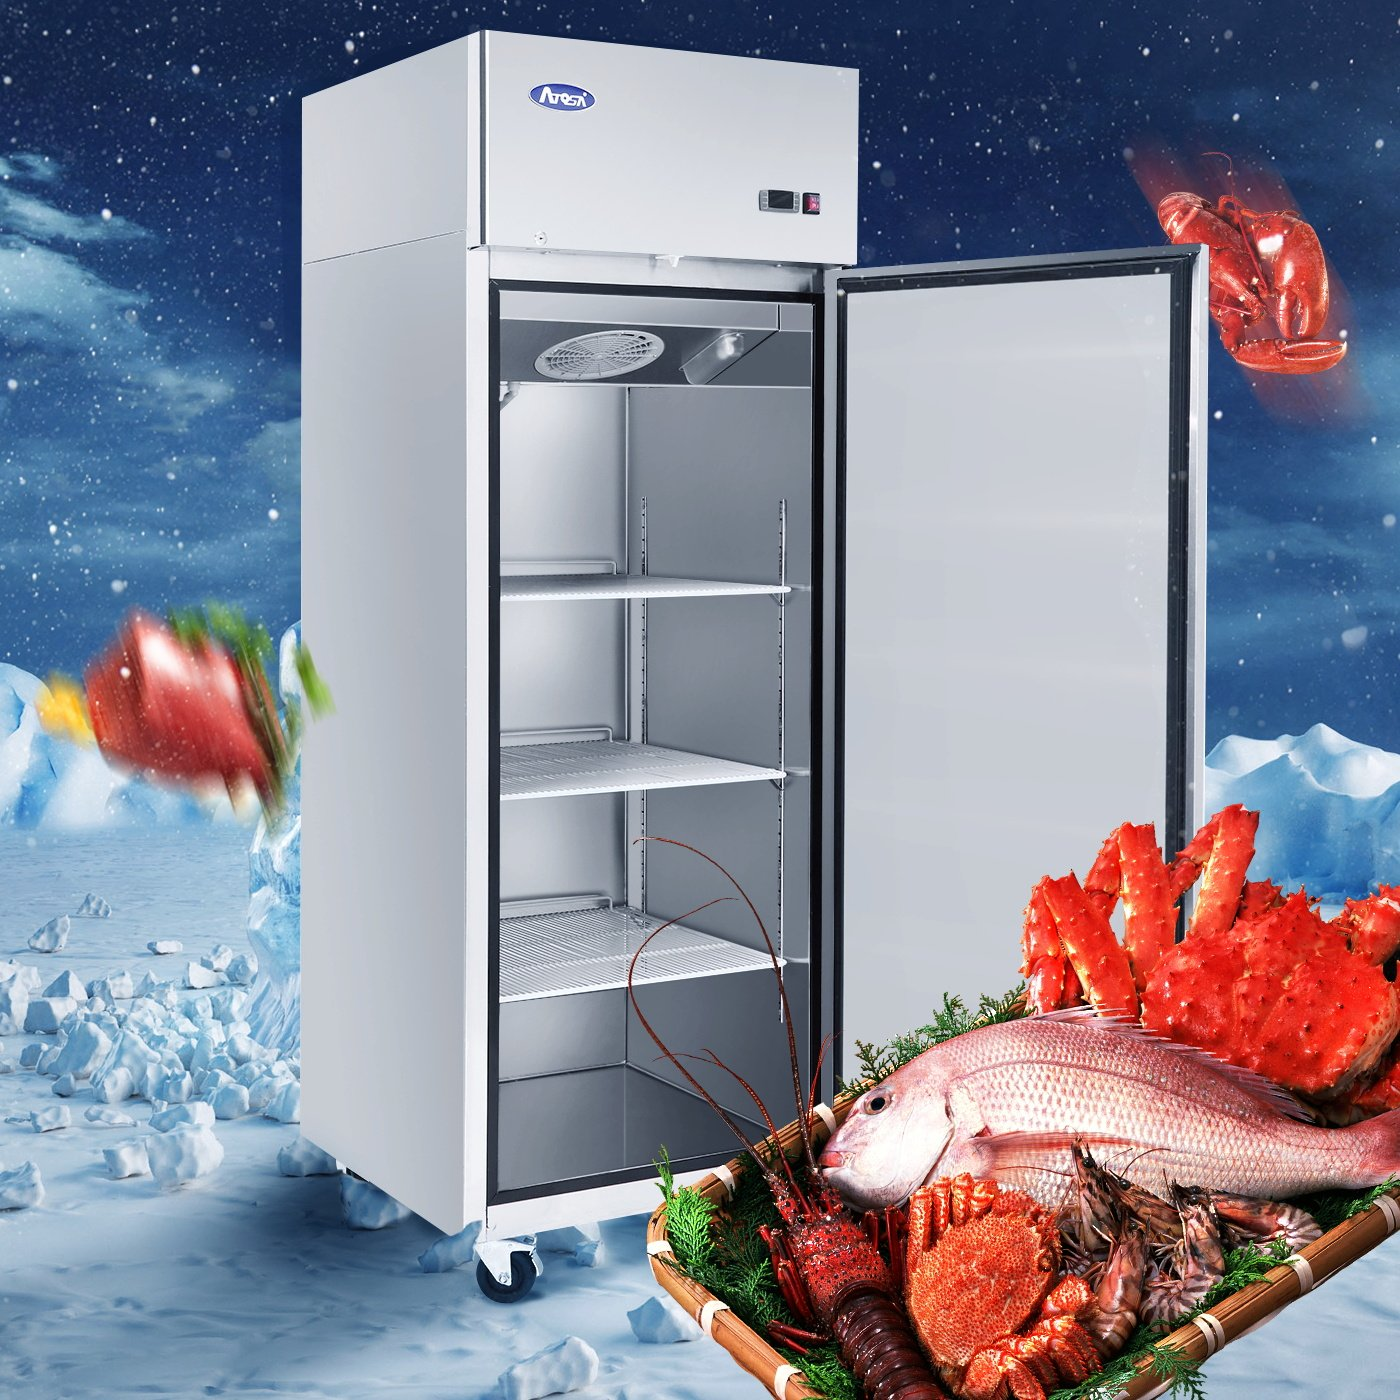 Amazon.com: Commercial Refrigerator,ATOSA MBF8004 Single 1-Door Top ...